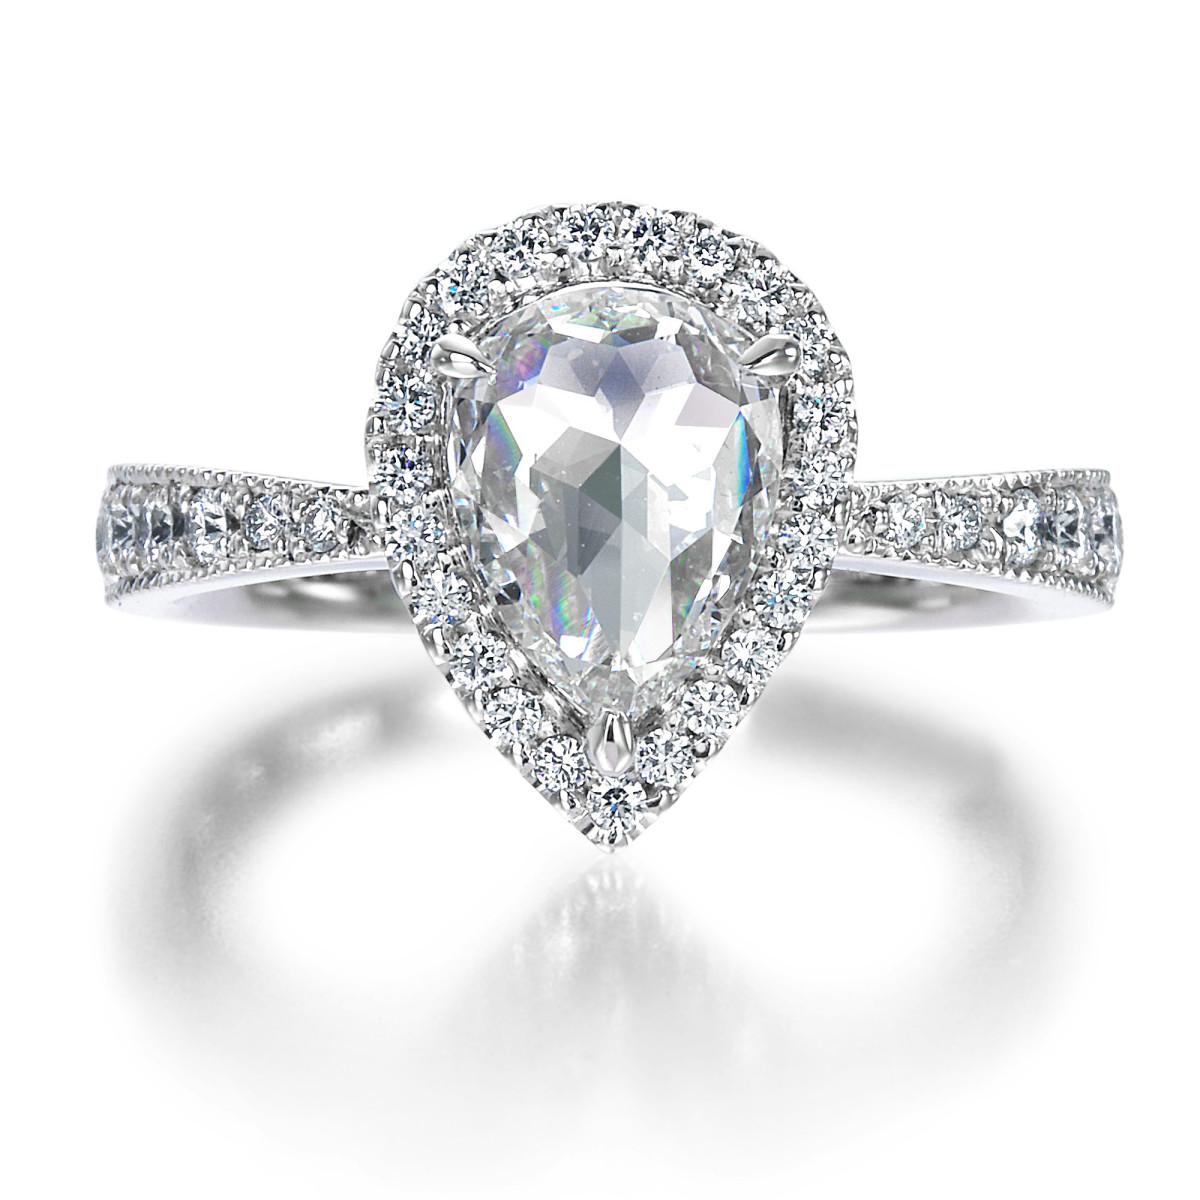 1ct pear shape rose cut halo diamond engagement ring